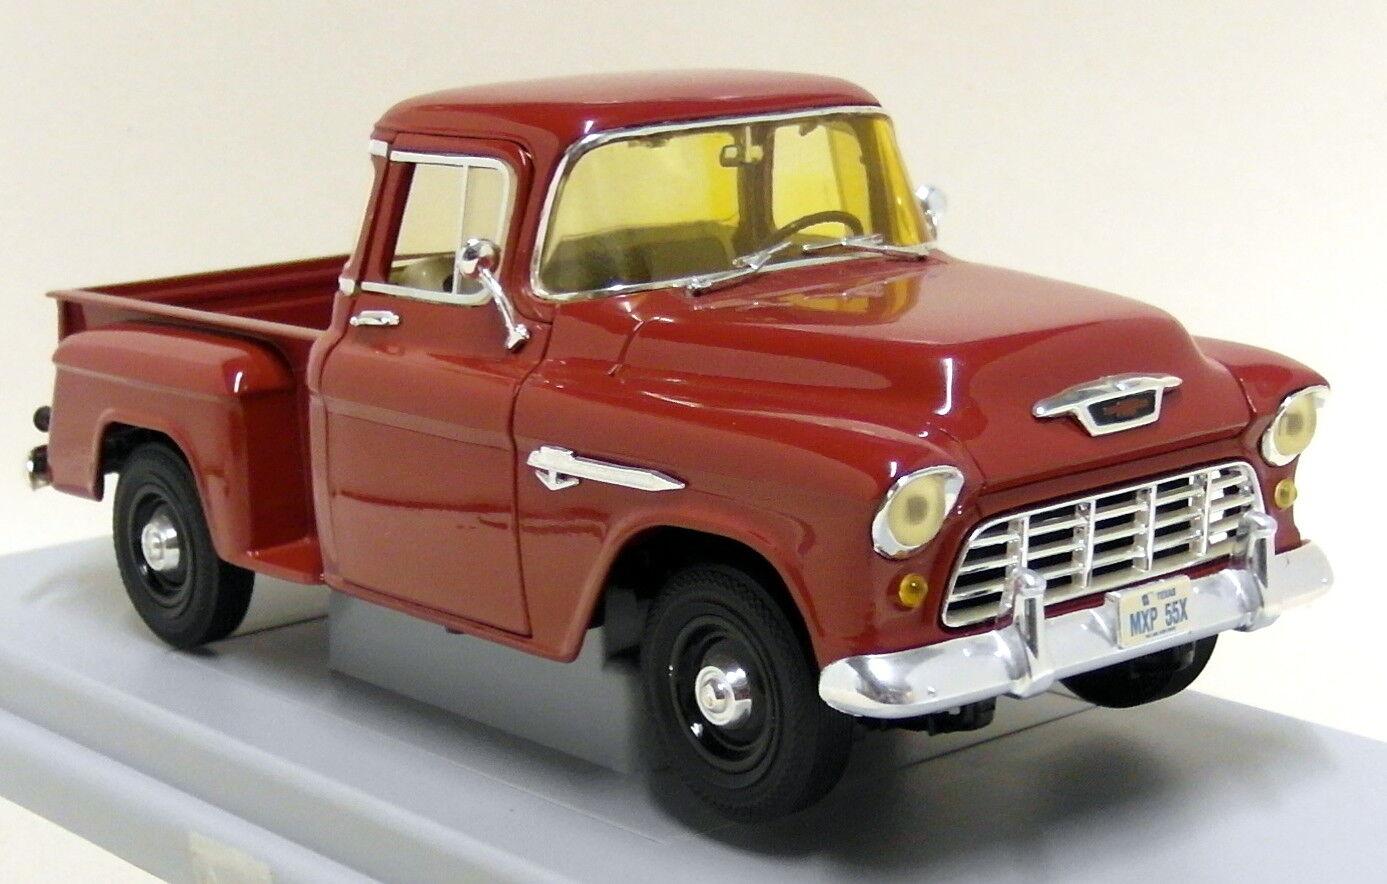 Ertl Escala 1 18 - 7788 1955 Chevy 3100 Stepside Pickup rosso Diecast Modelo de Coche